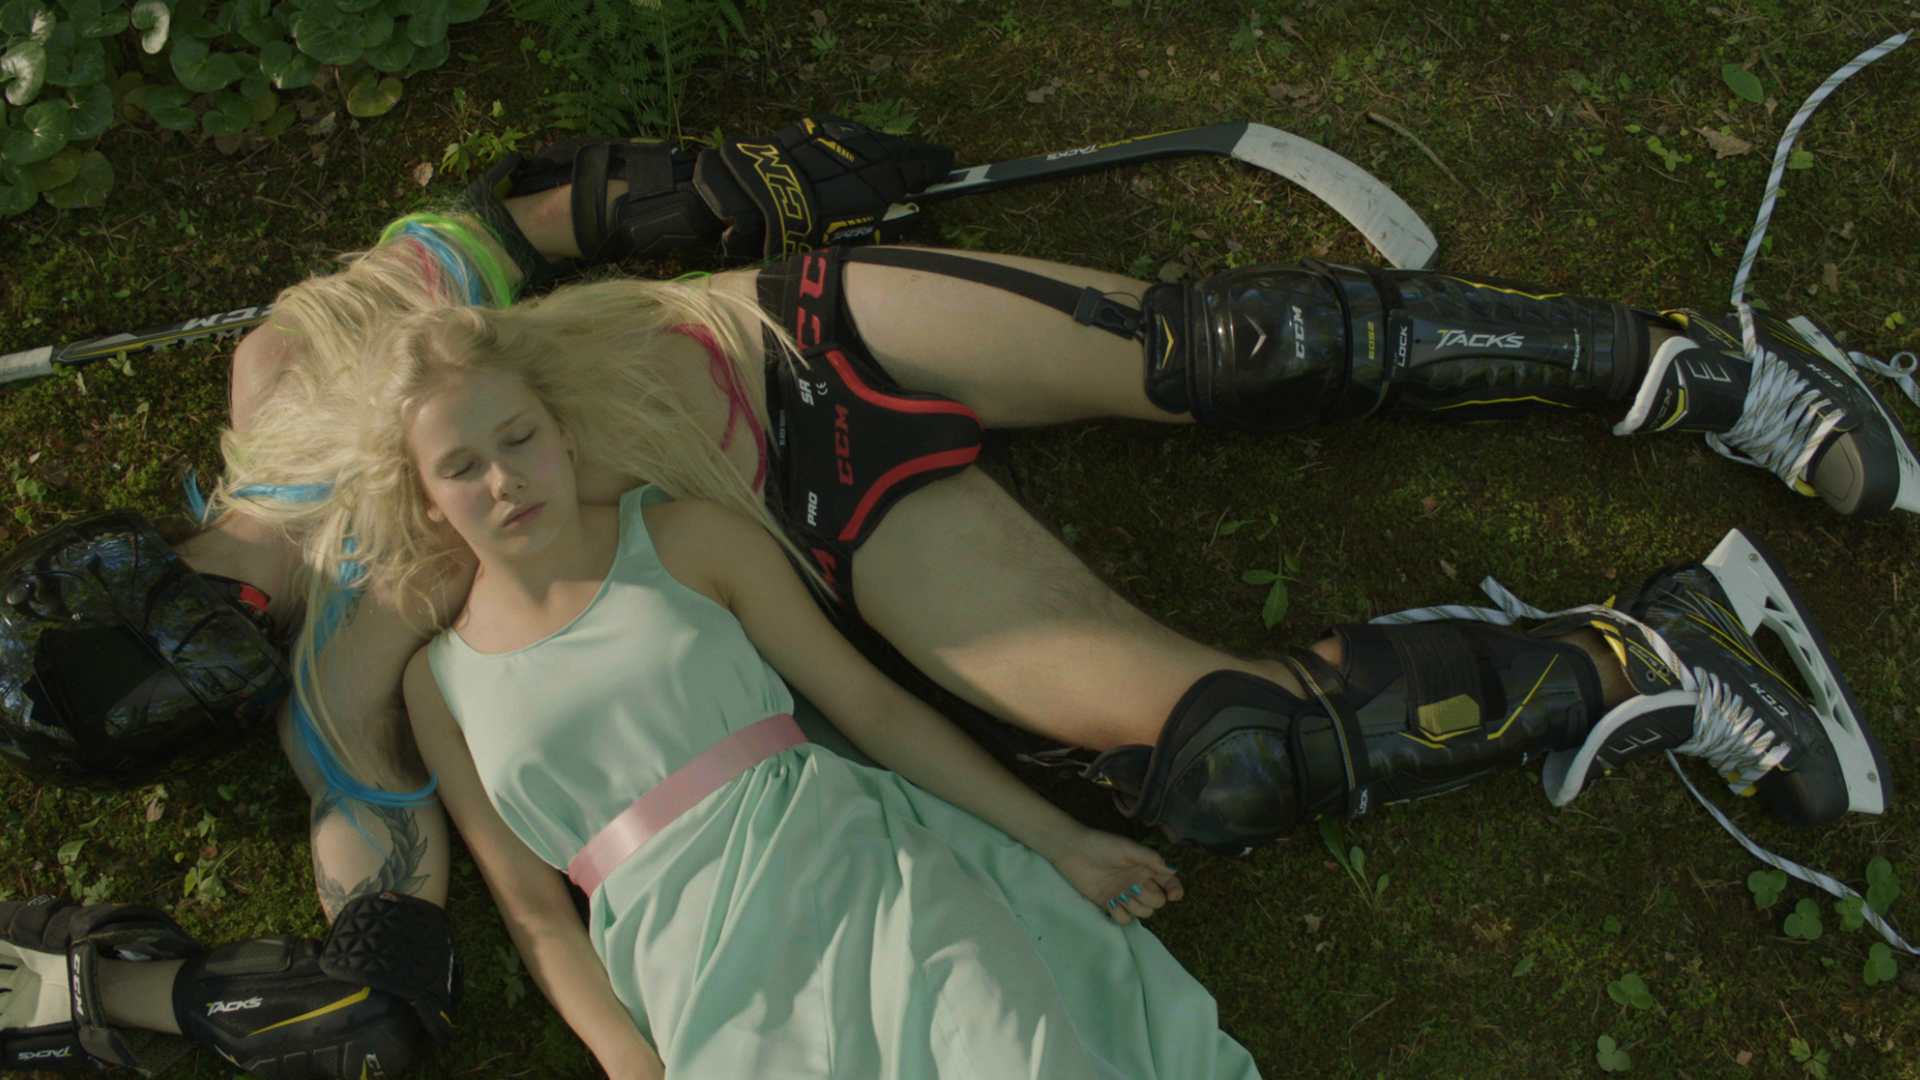 Hannaleena Hauru: The Ice Hockey Film by Heidi (2017)